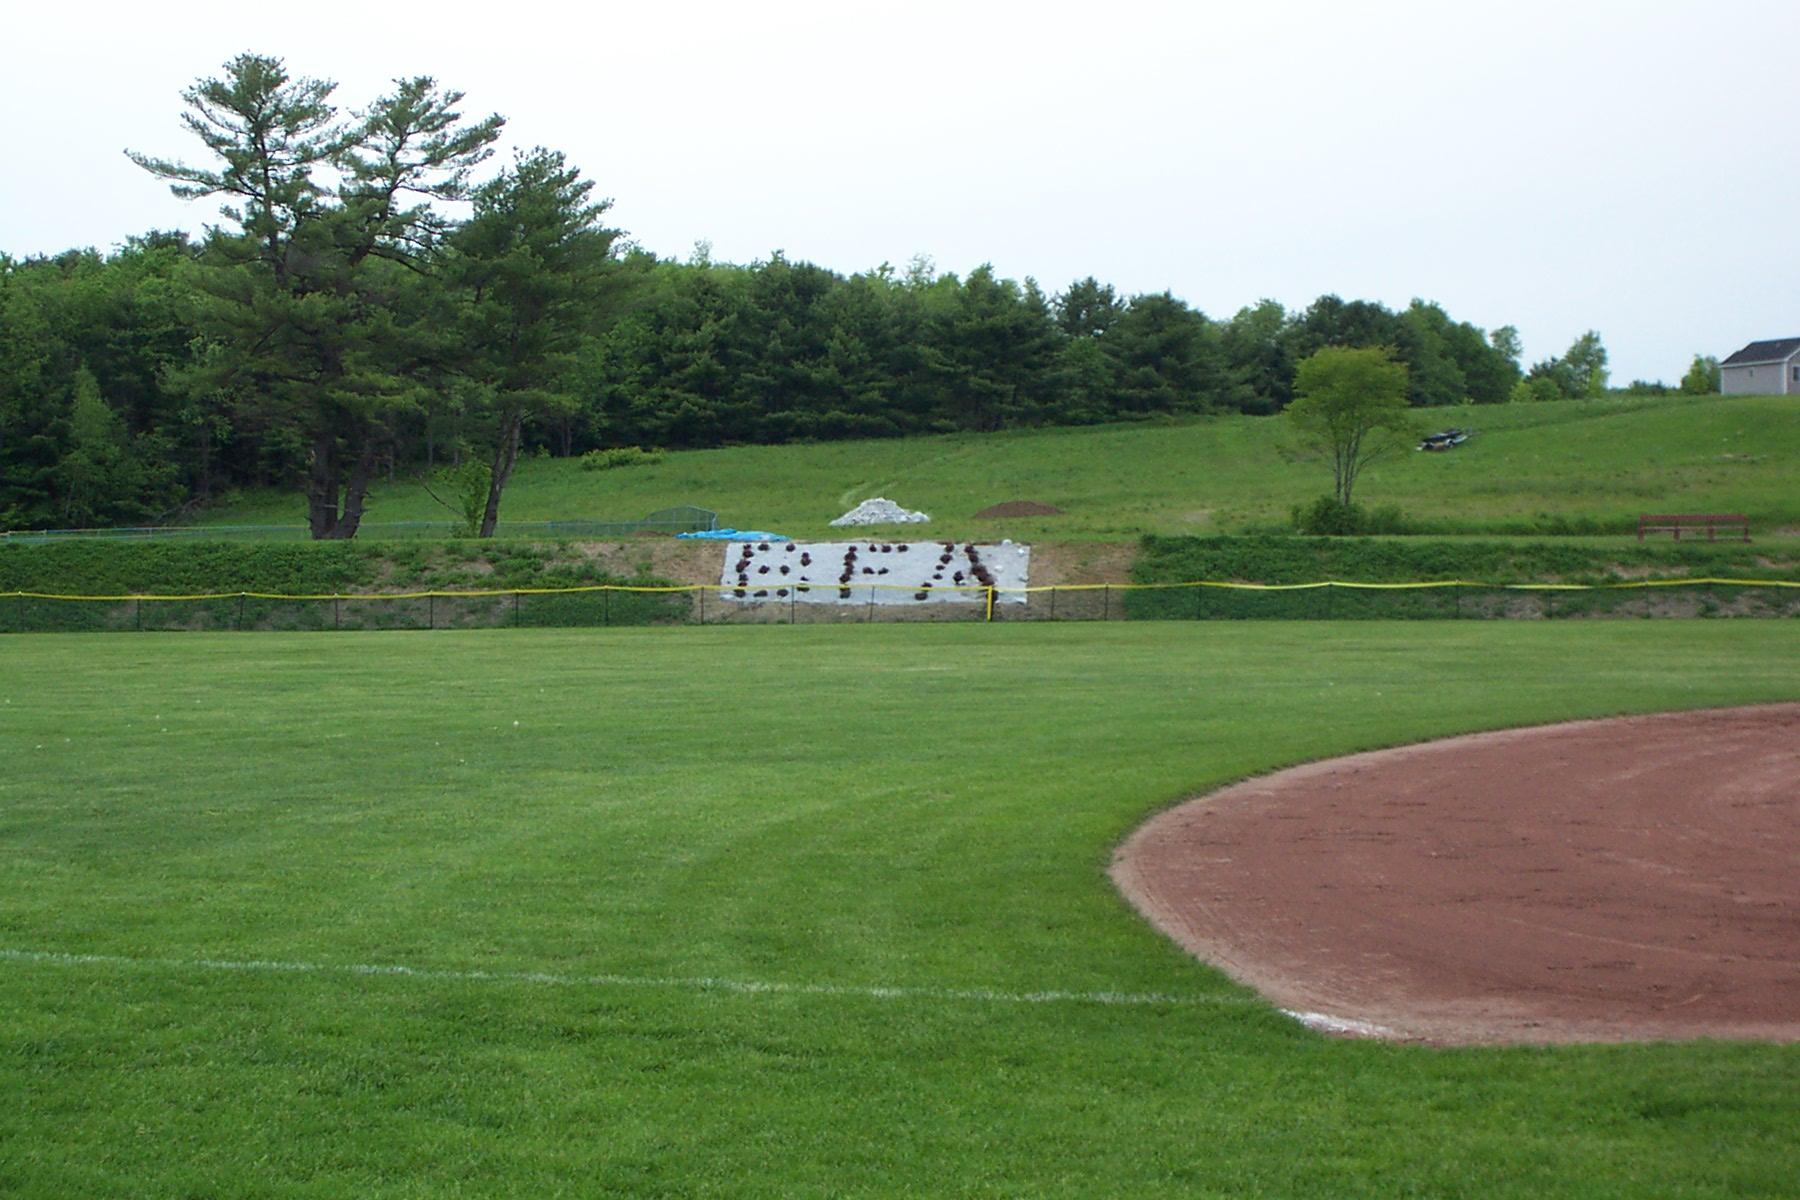 2008-05-30 012